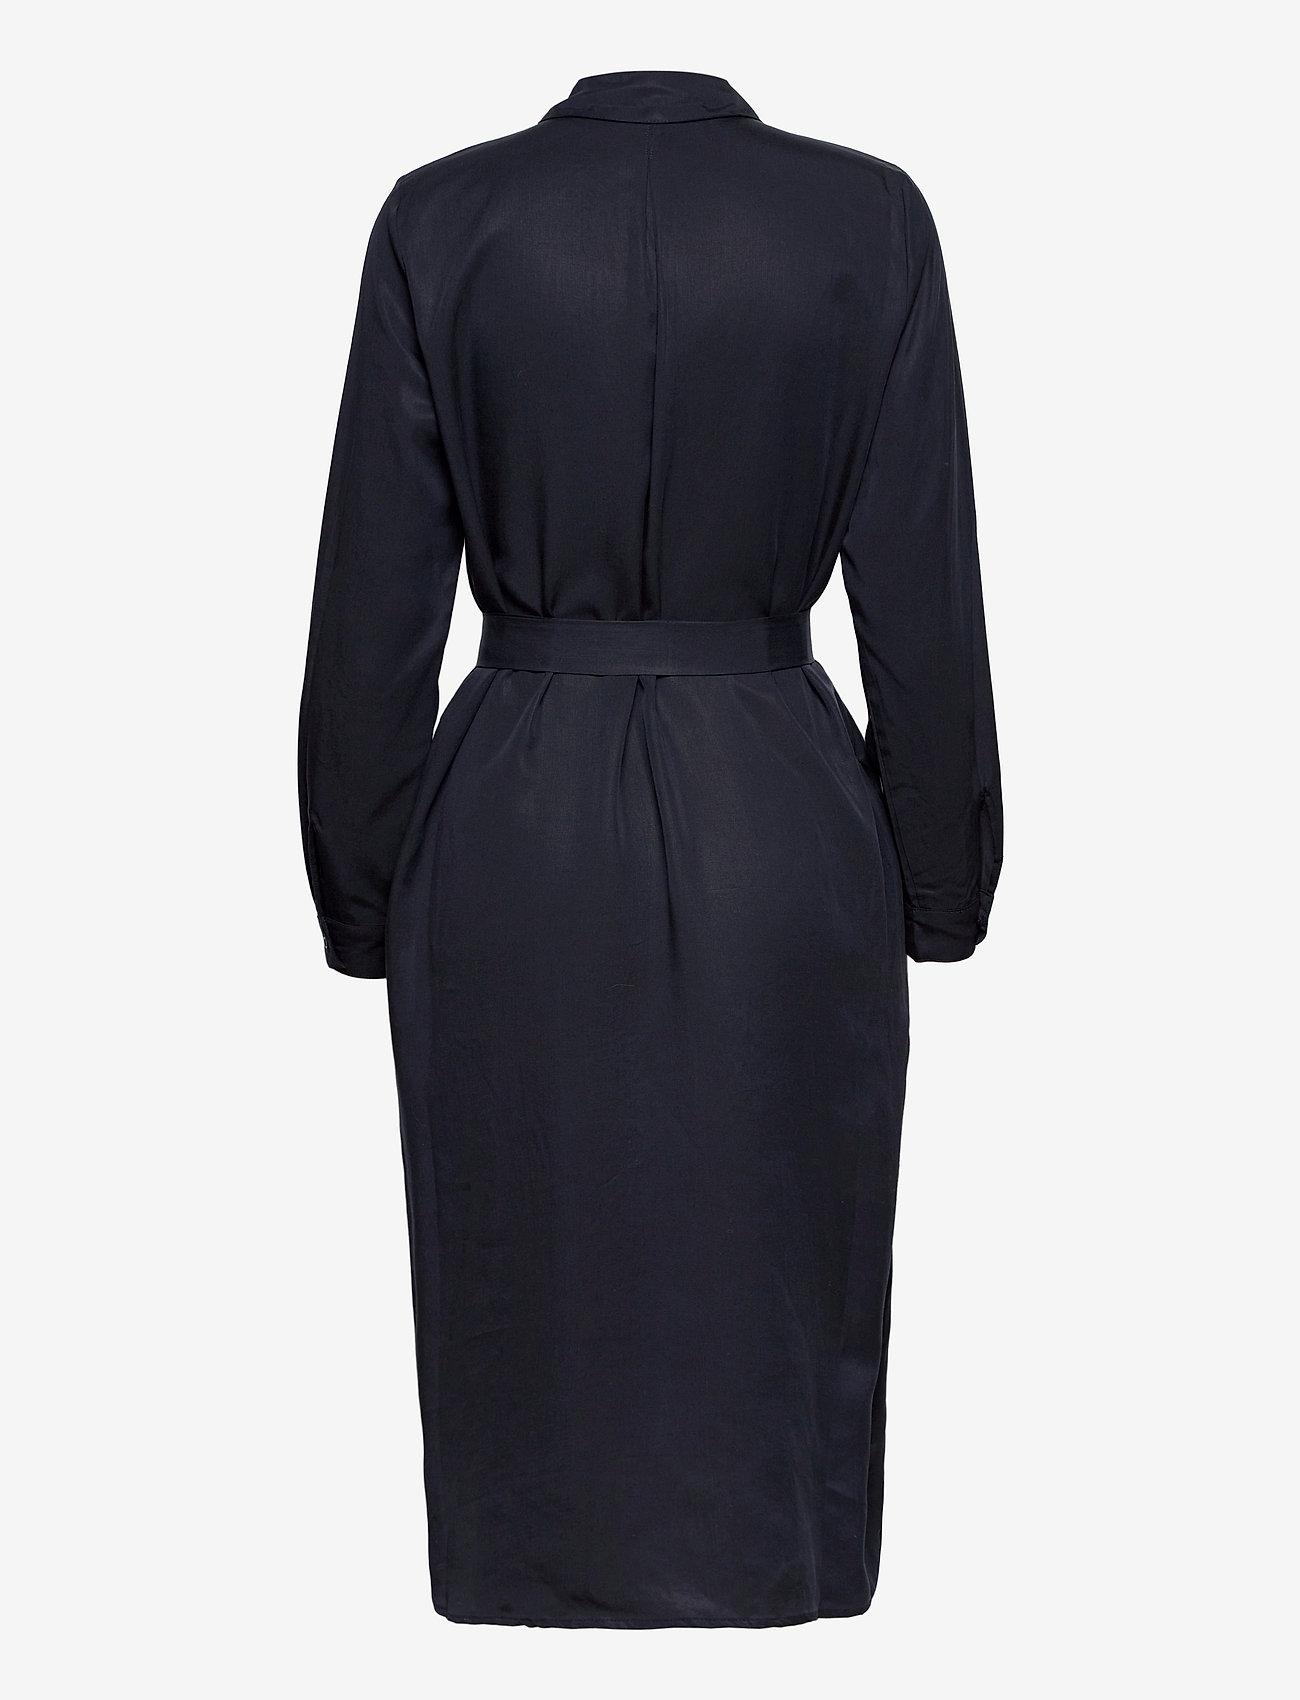 Esprit Casual - Dresses light woven - midi dresses - navy - 1